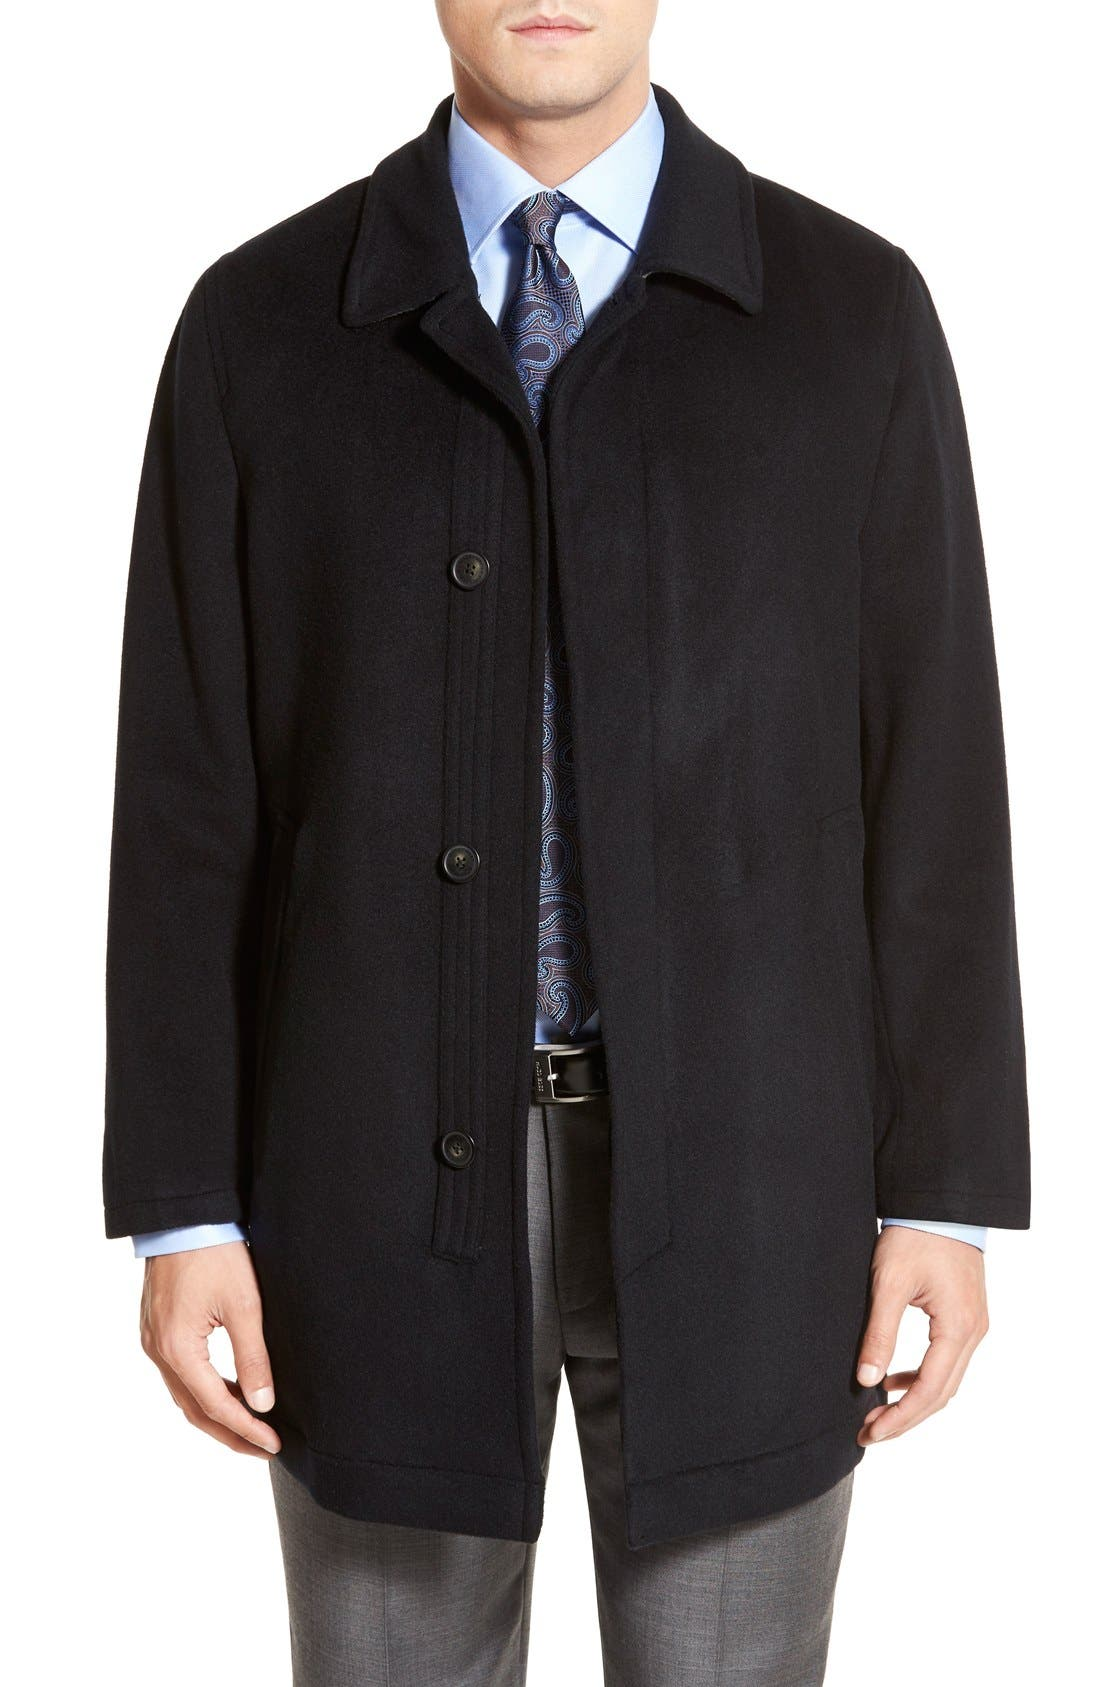 Alternate Image 1 Selected - Hart Schaffner Marx Douglas Modern Fit Wool & Cashmere Overcoat